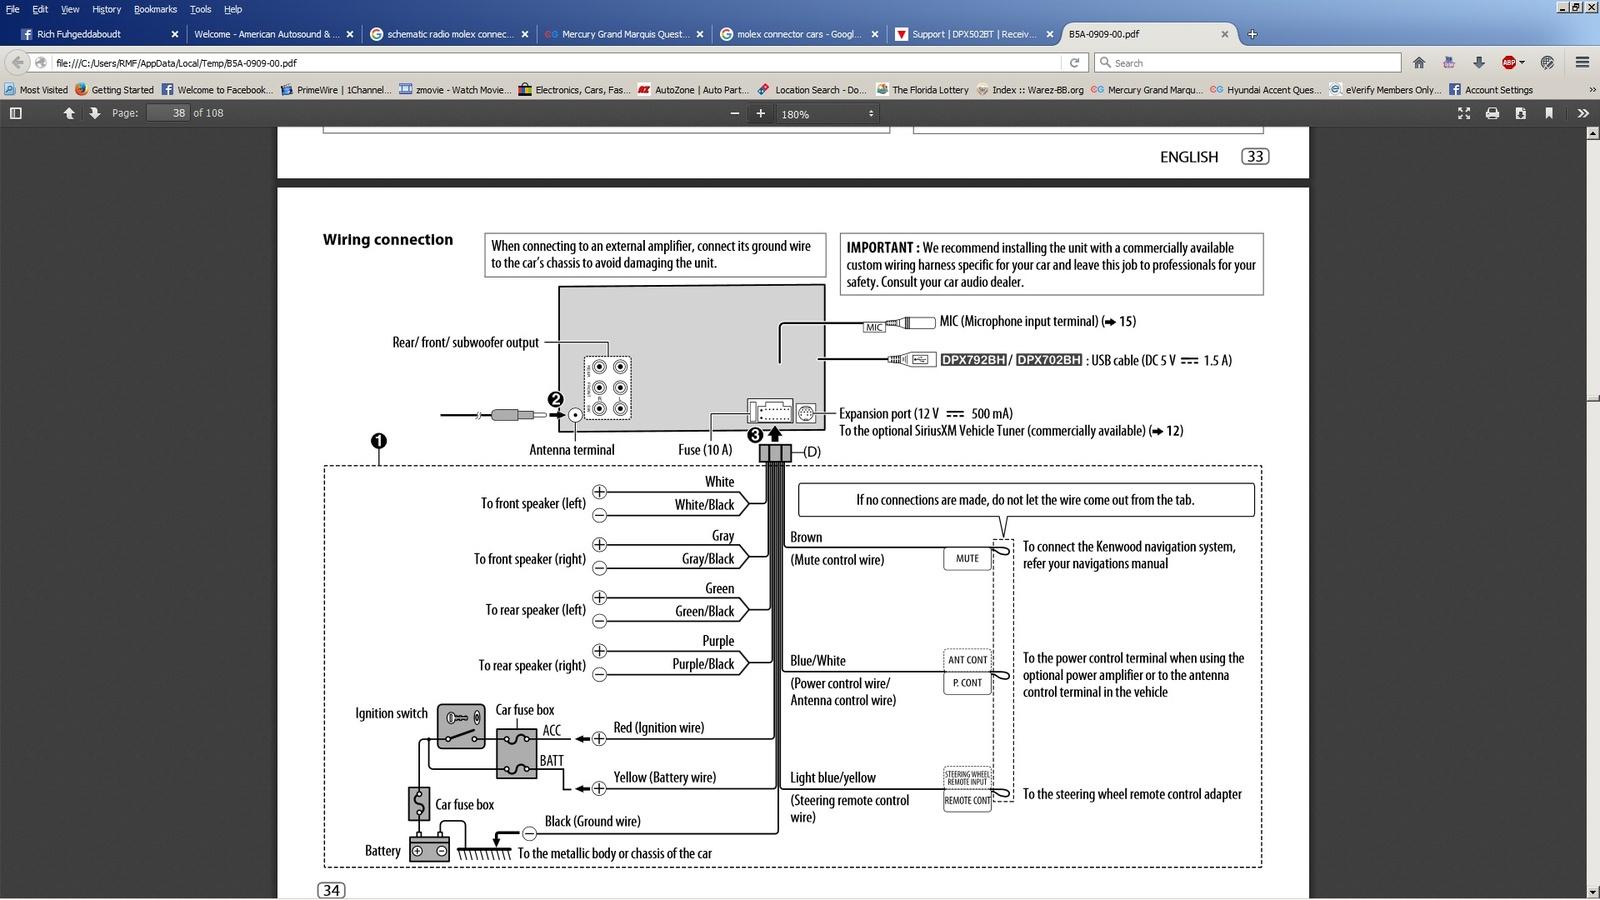 Mercury Grand Marquis Questions - Help With Stereo Wiring - Cargurus - 2007 Tahoe Radio Wiring Diagram